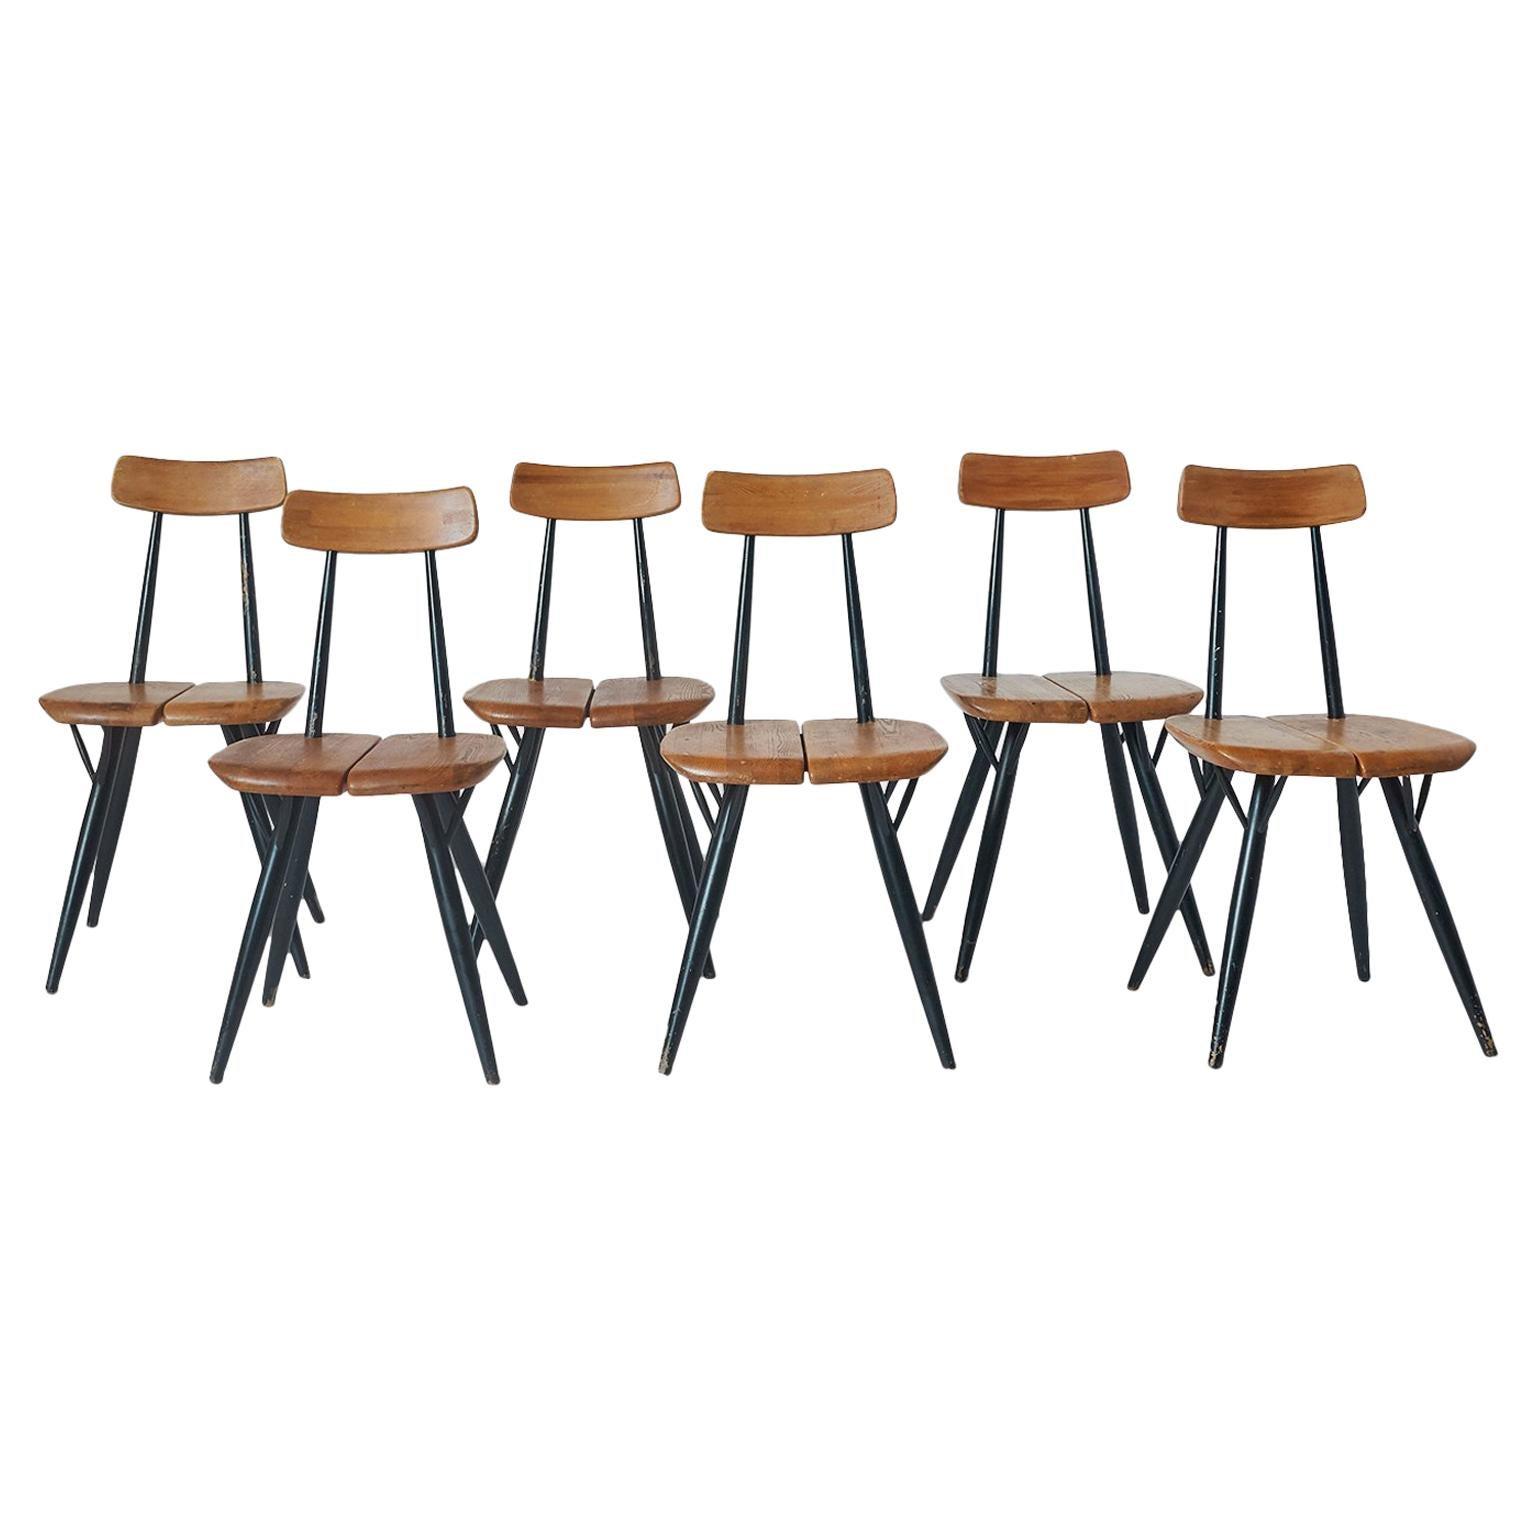 "Set of 6 ""Pirkka"" Chairs by Ilmari Tapiovaara"